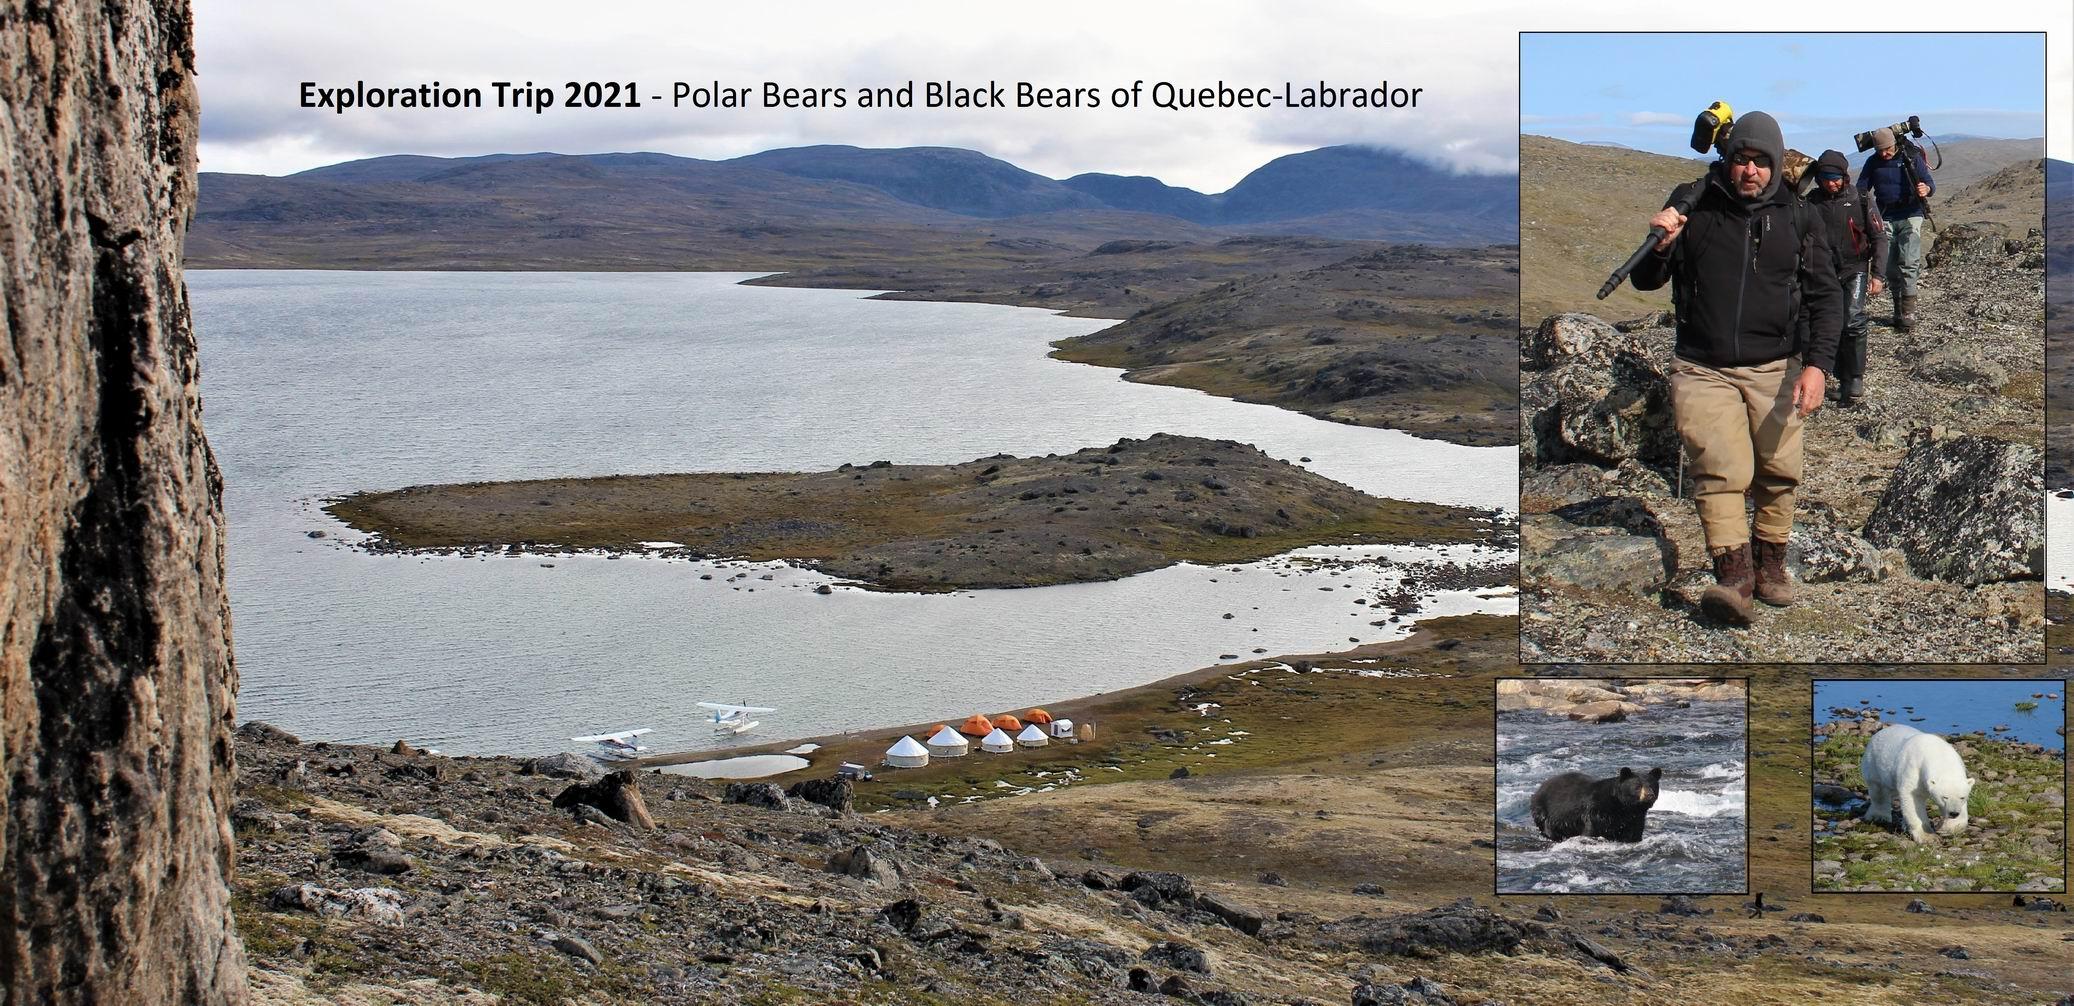 Exploration Trip - Polar Bears and Black Bears of Quebec-Labrador